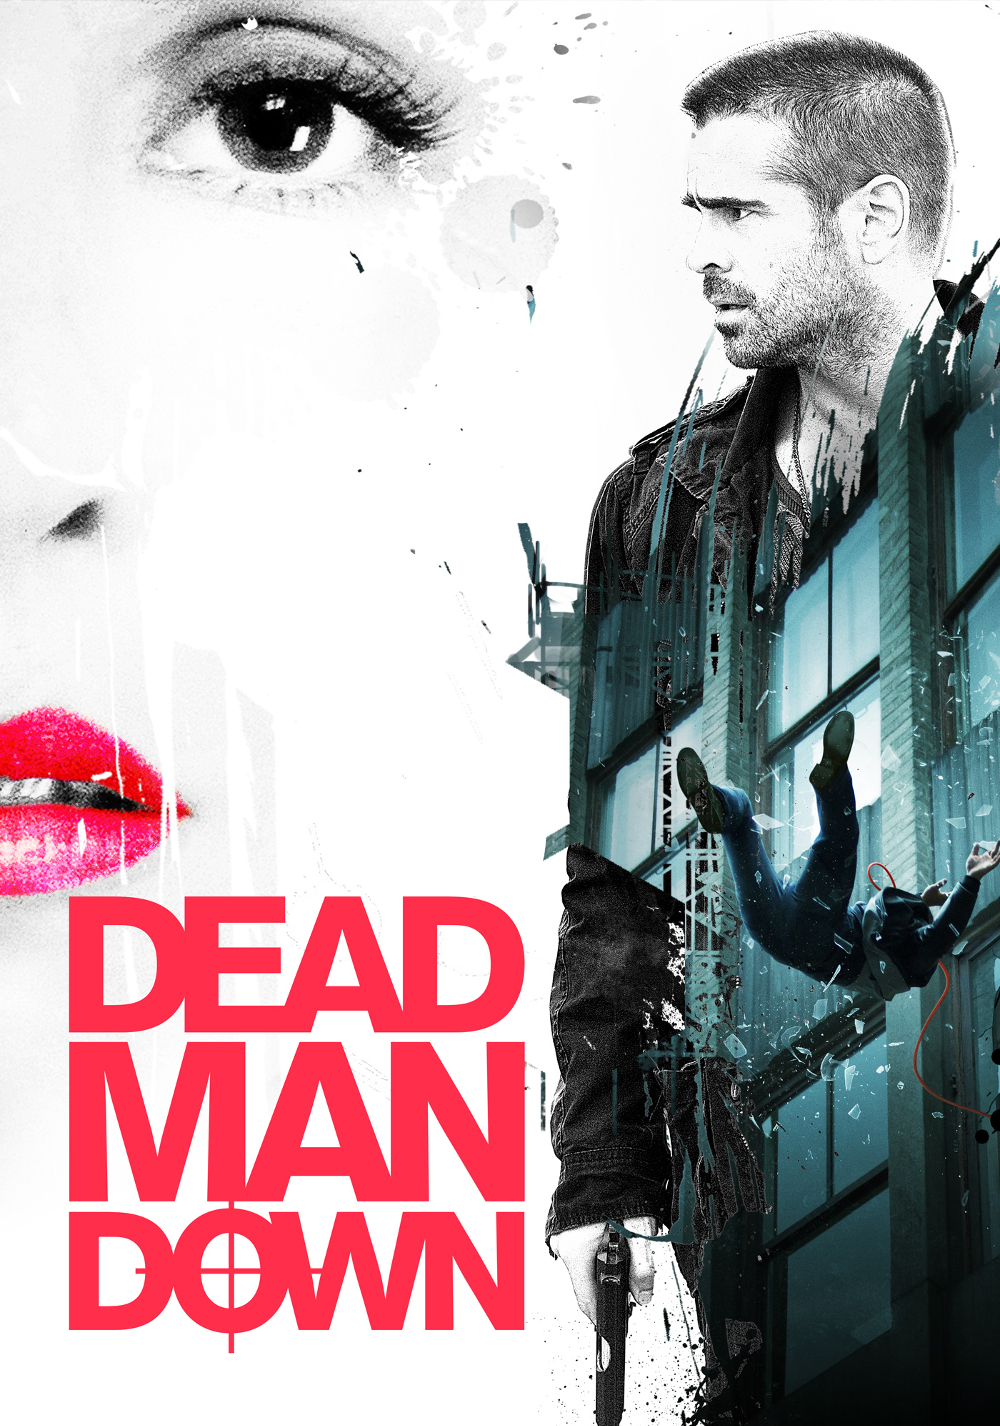 Dead Man Down Film